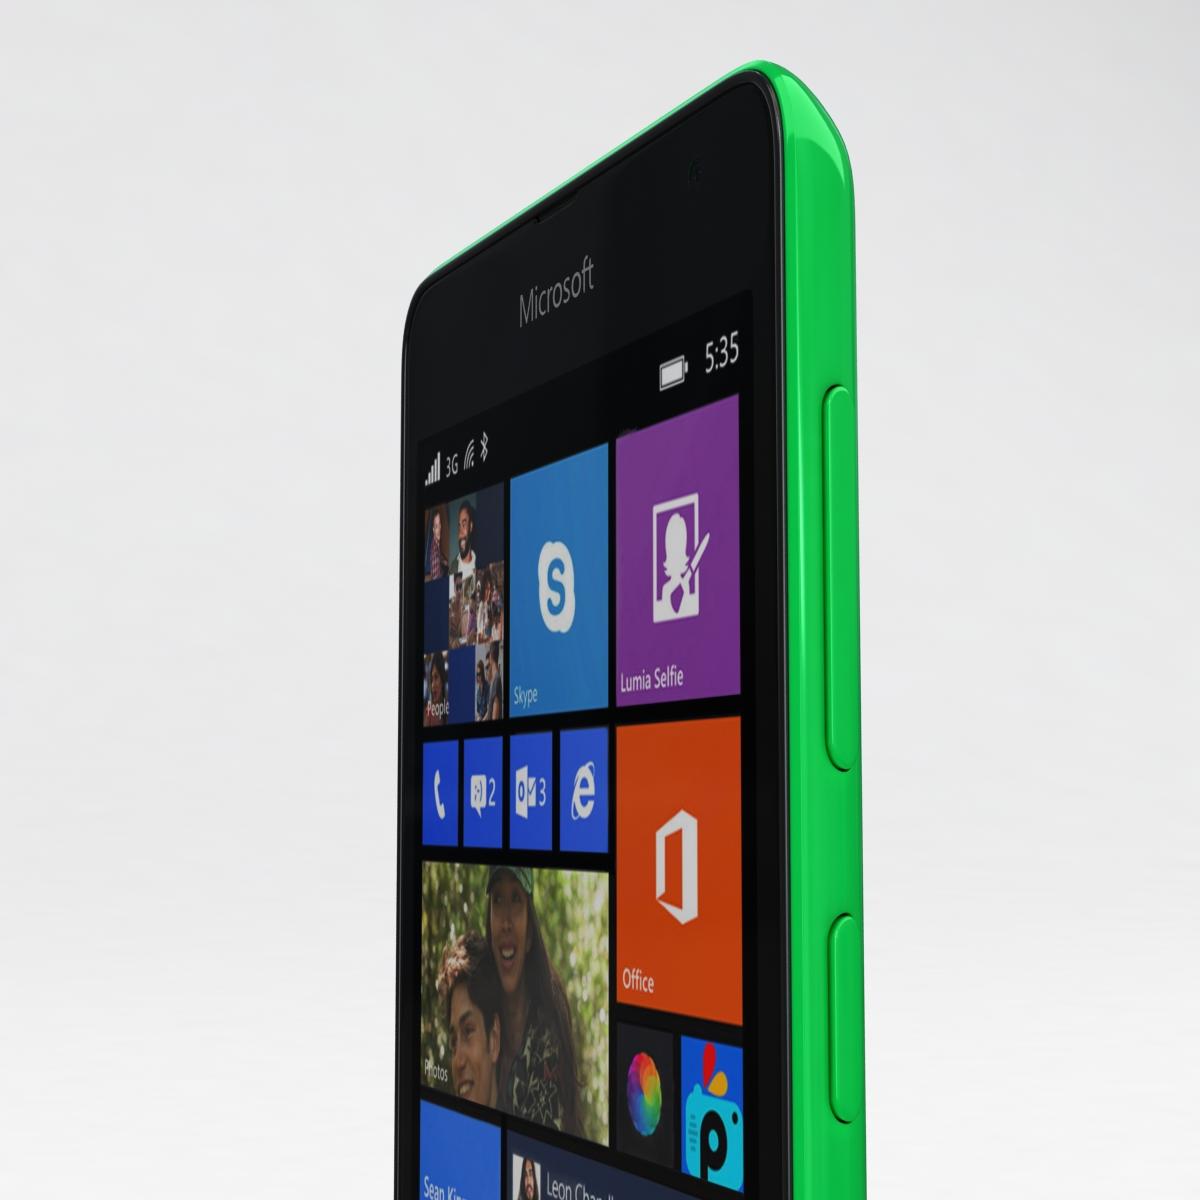 microsoft lumia 535 and dual sim green 3d model 3ds max fbx c4d obj 204179